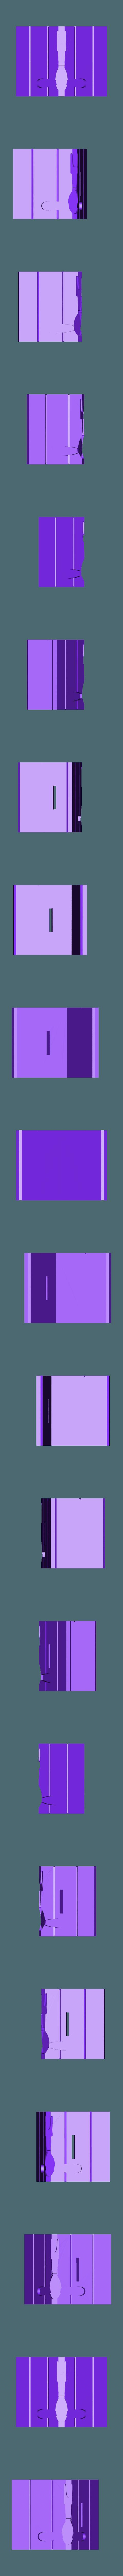 Snoopy_house_roof_v1.stl Download free STL file Snoopy on Doghouse Bank • 3D print object, lowboydrvr